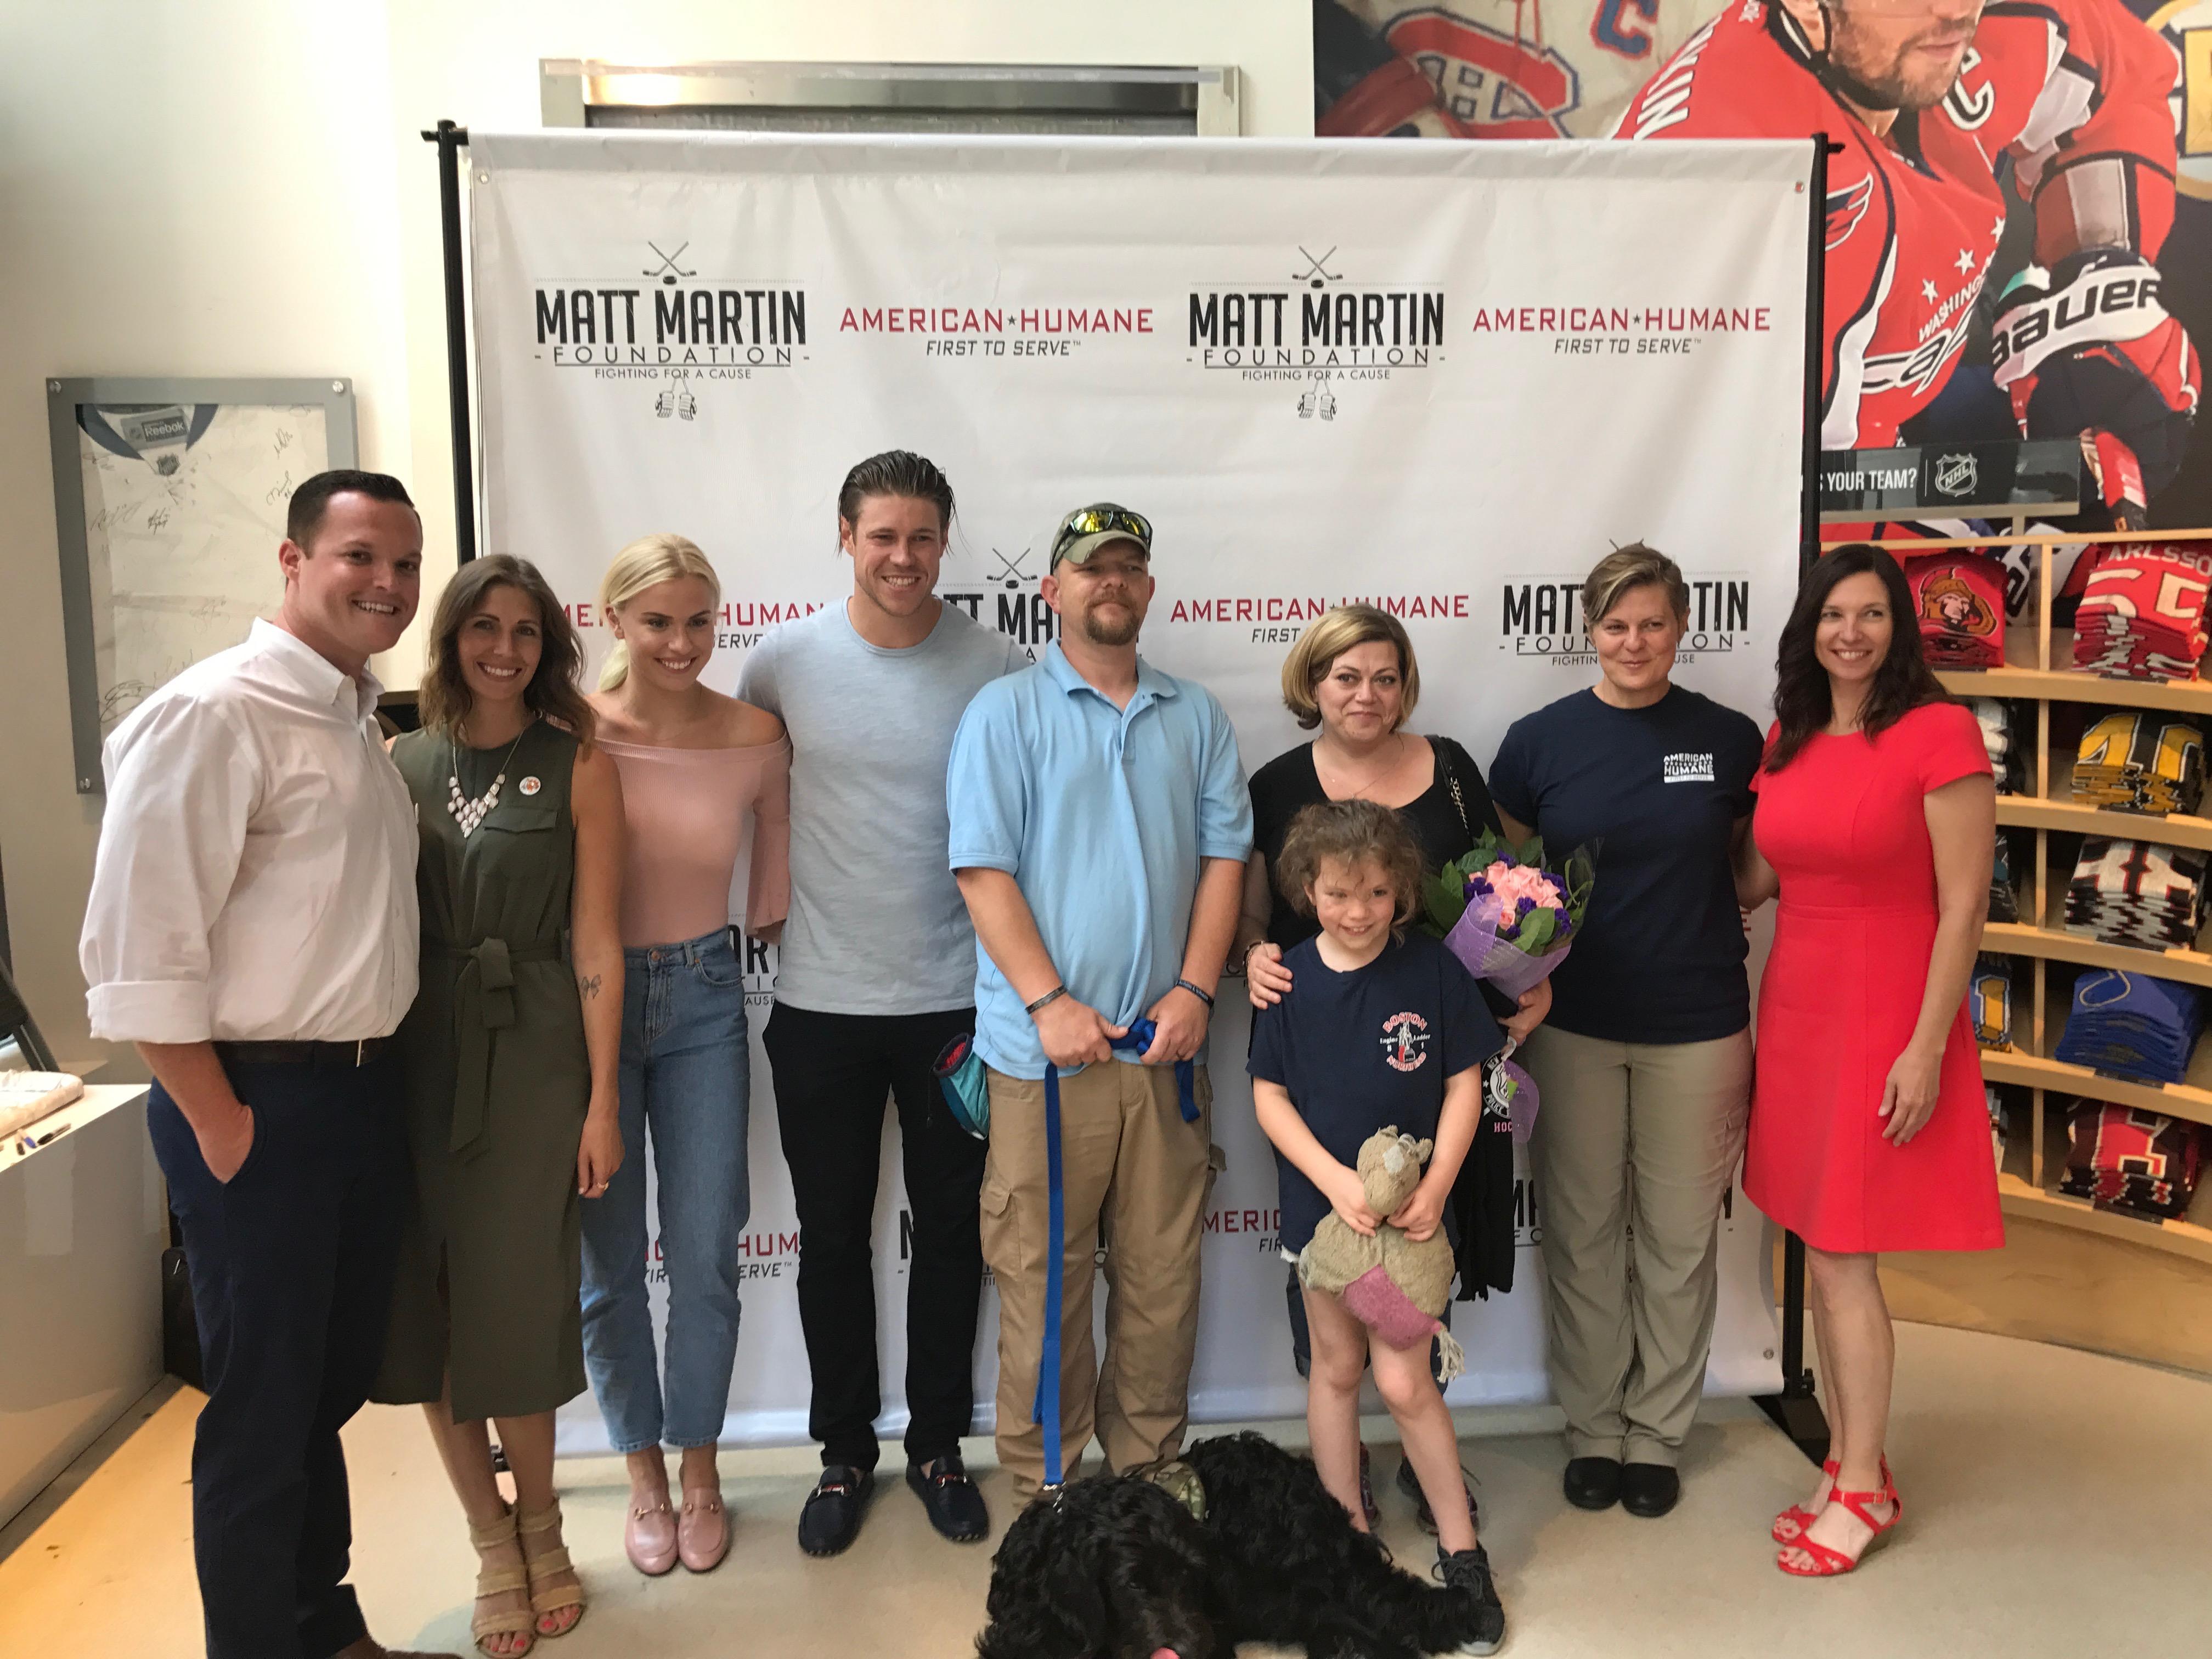 Matt Martin Overwhelms Military Family at NHL Store